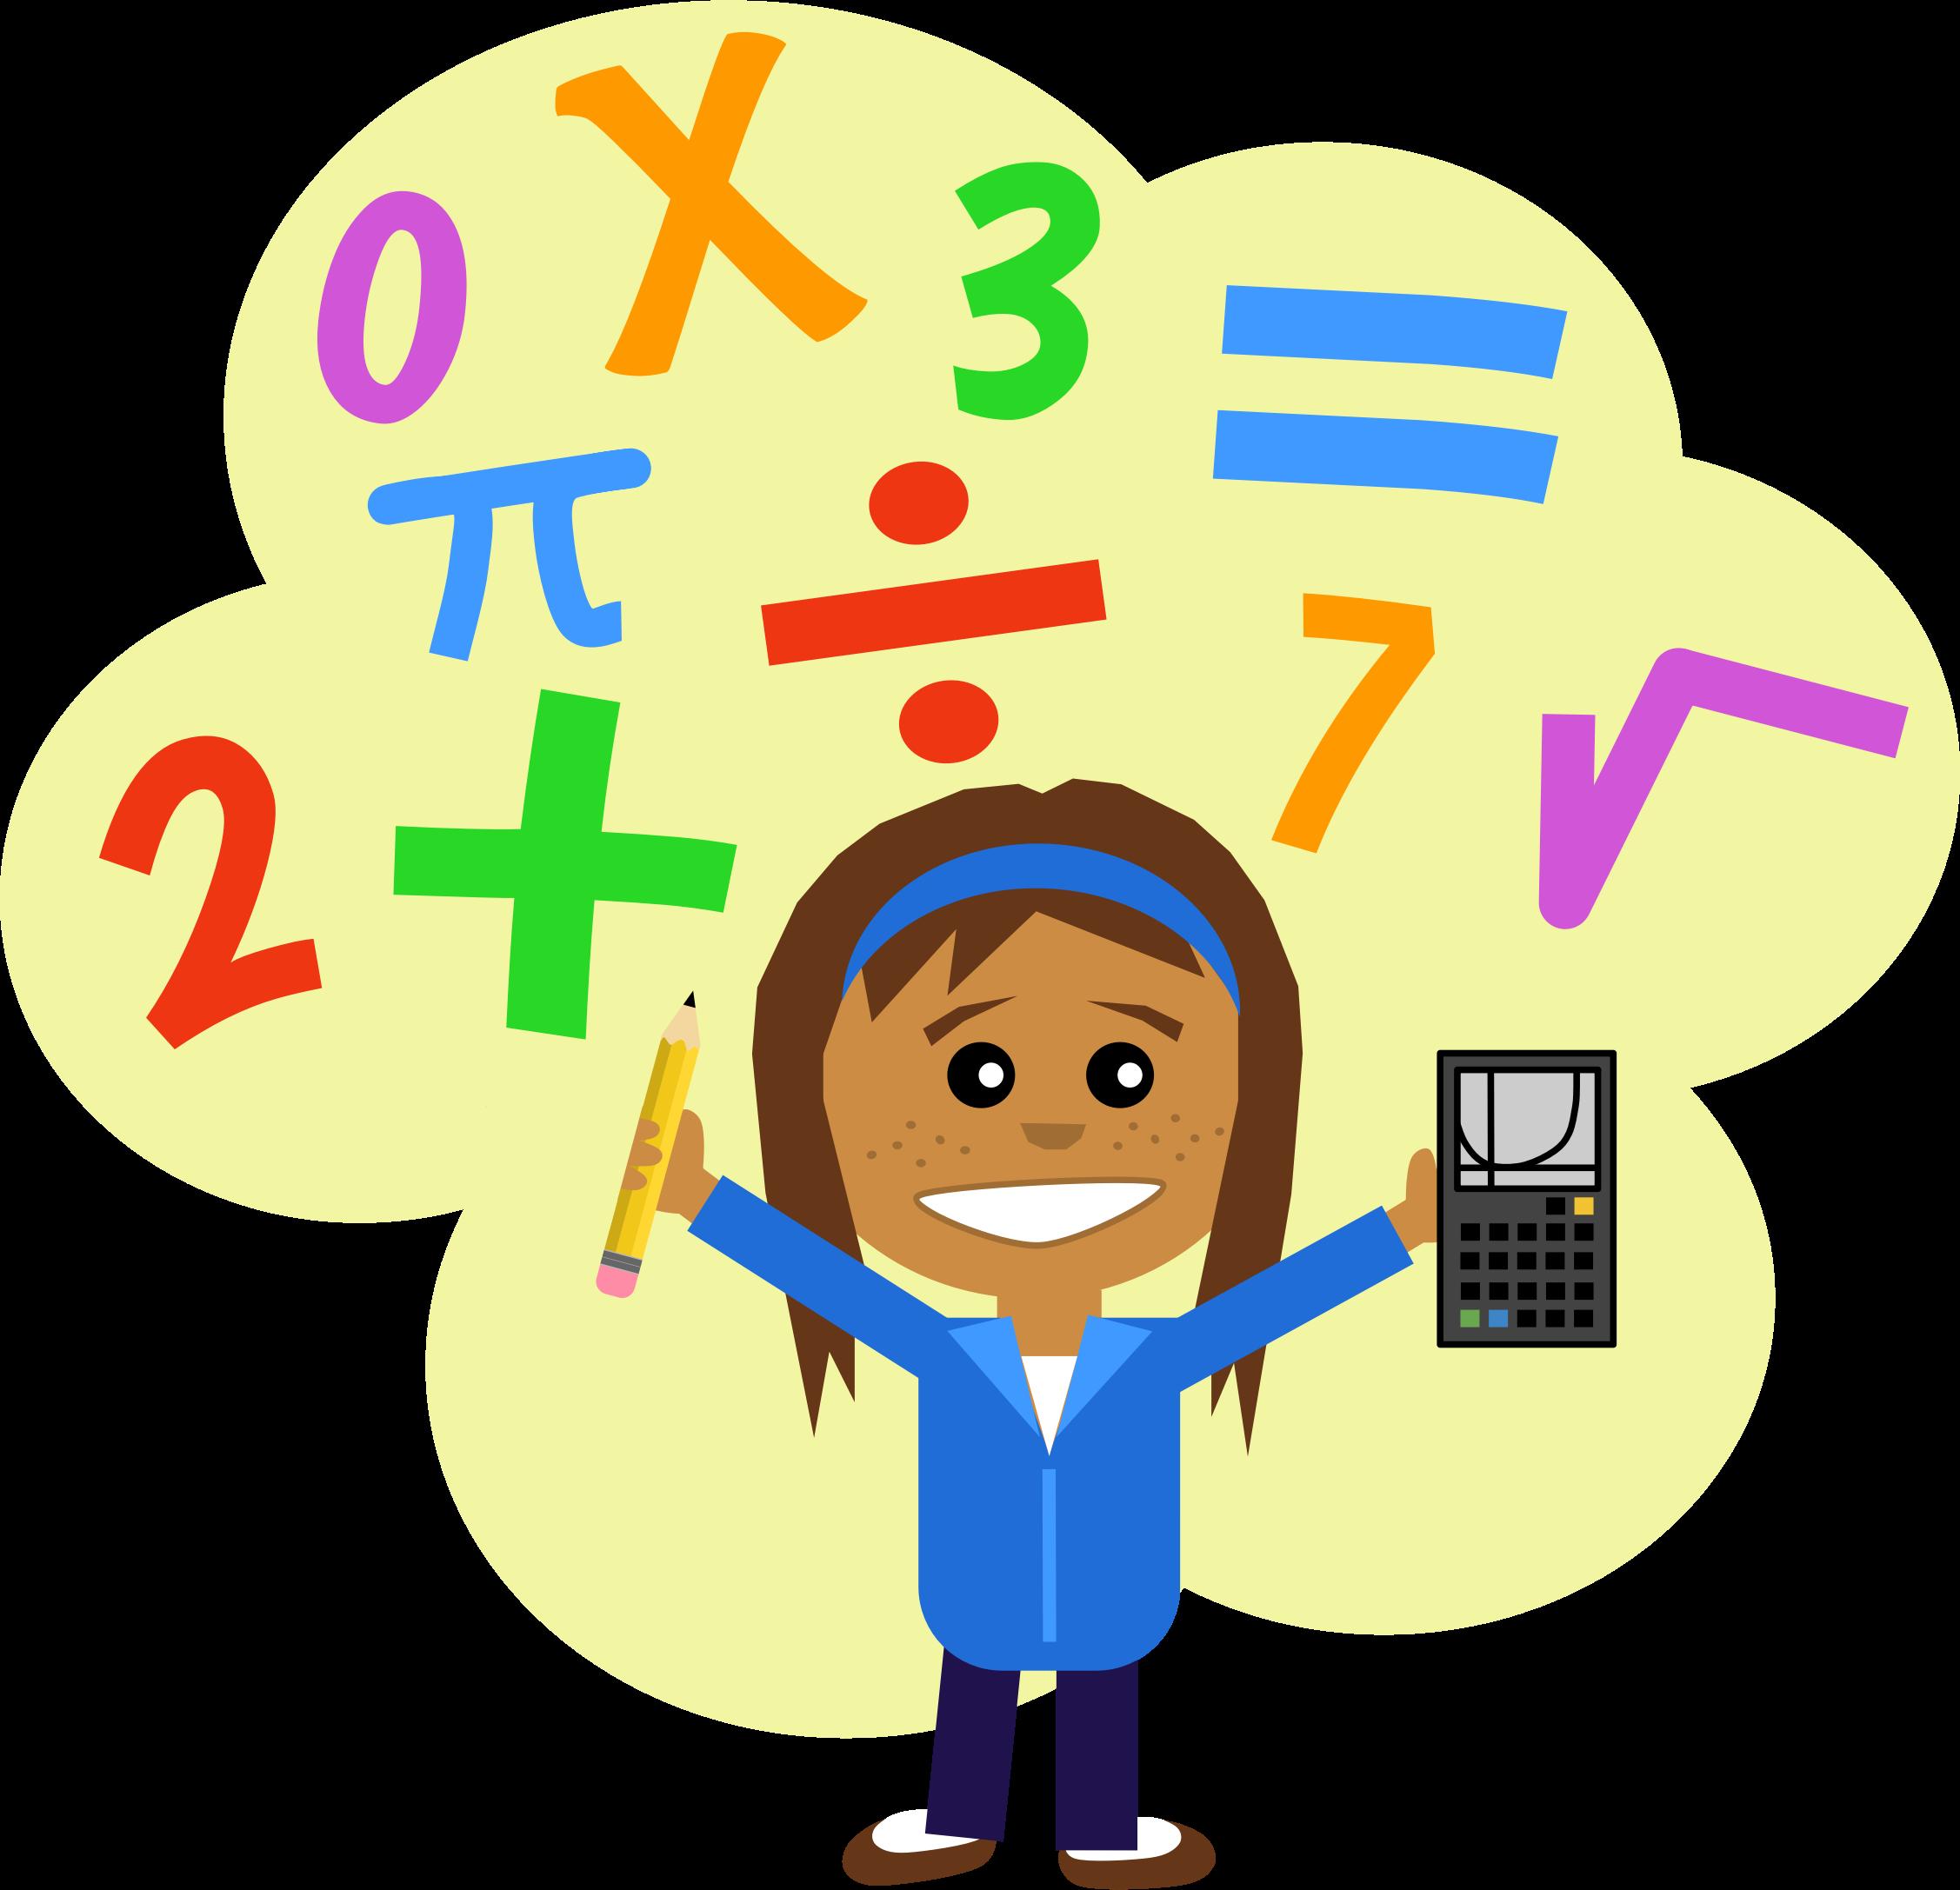 Math Symbols Clip Art N5 Free Image